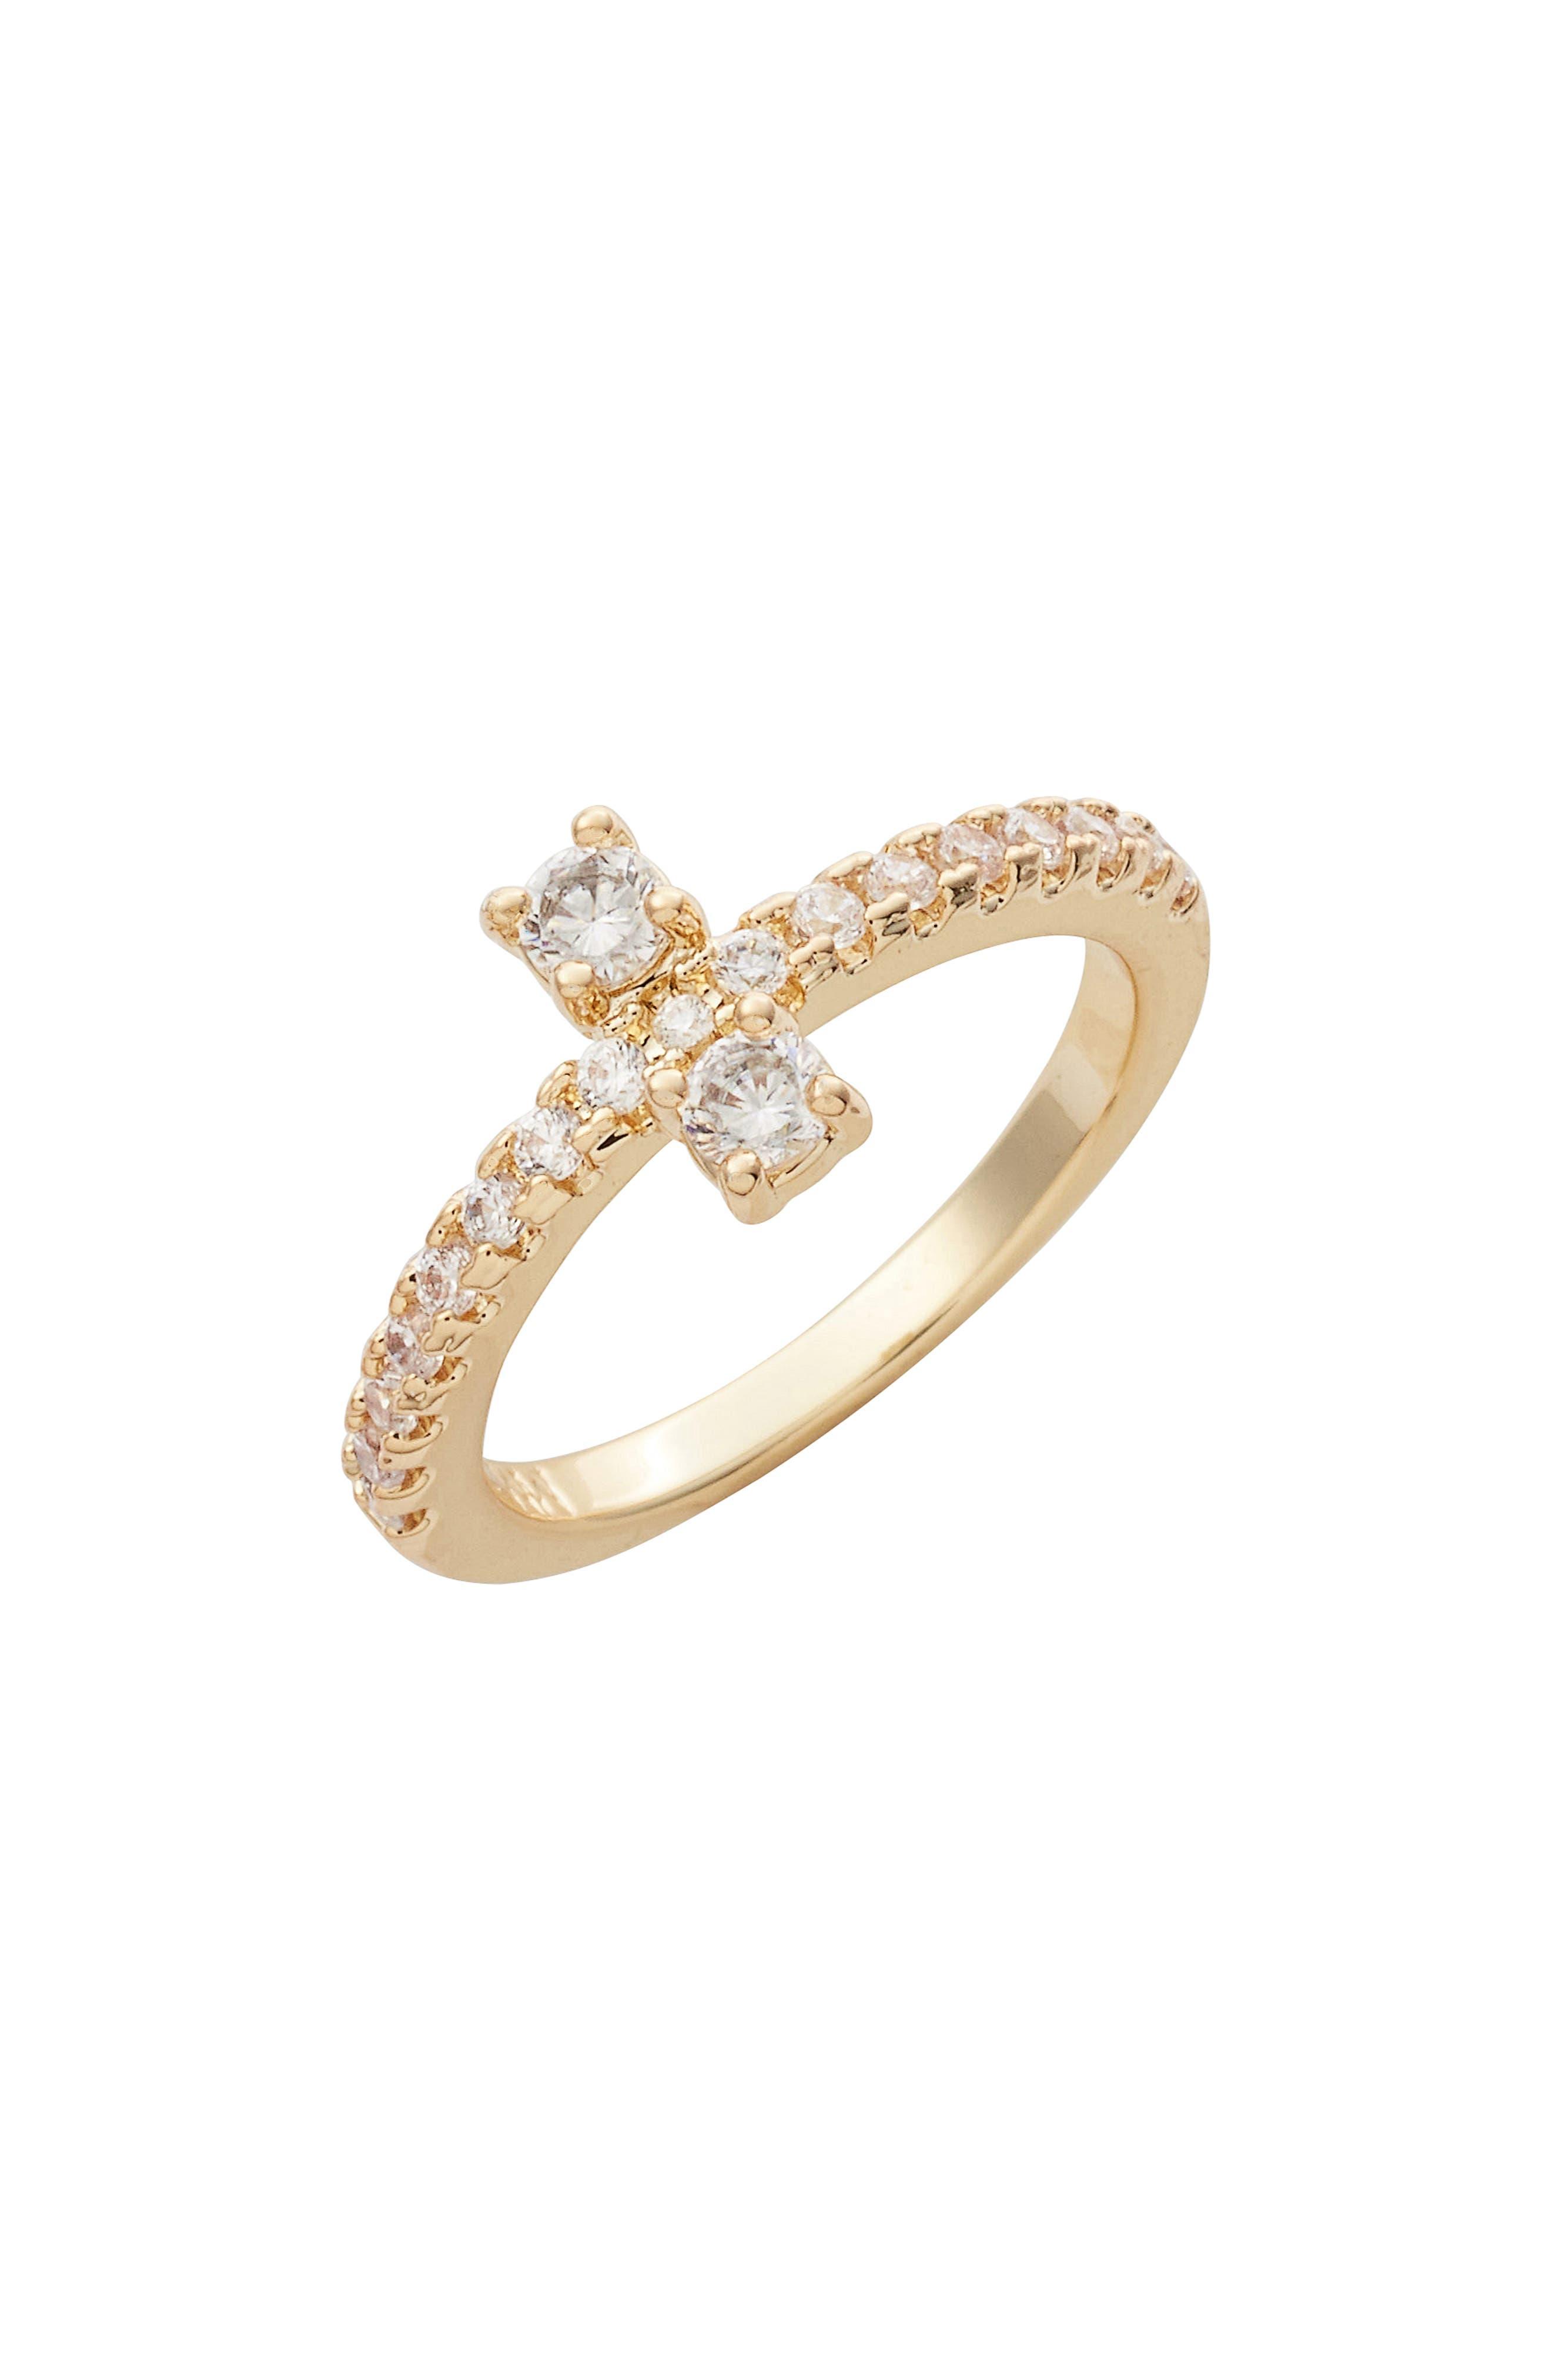 MELINDA MARIA Margaret Cluster Ring